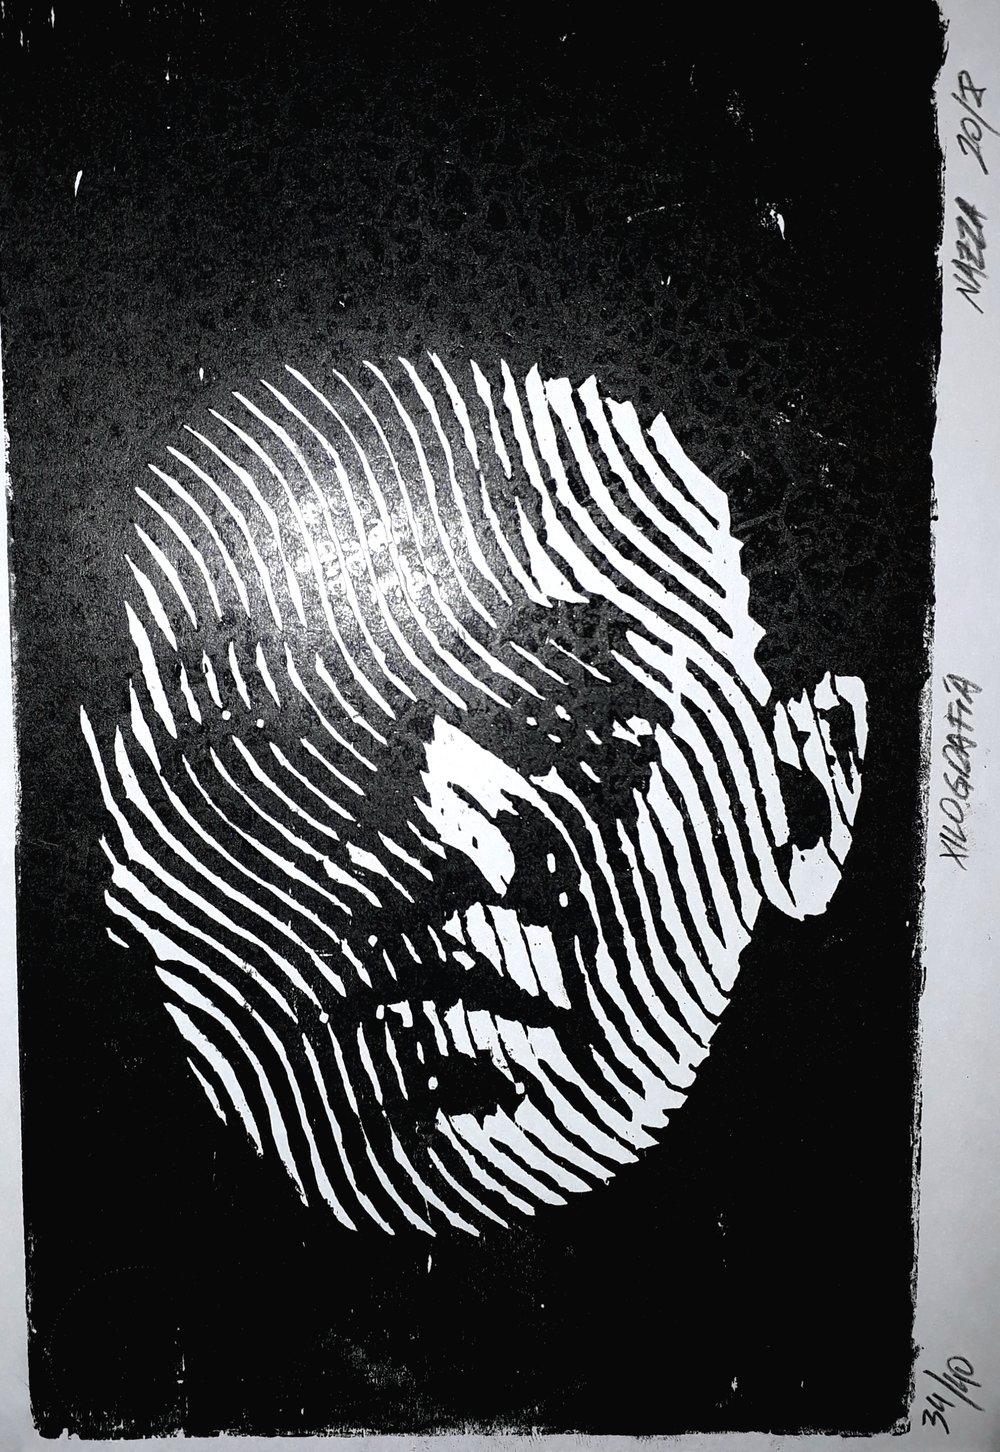 S.T (2018) - 29.5 x 21 cm - Xilografía a una tinta sobre papel / one ink xilography on paper